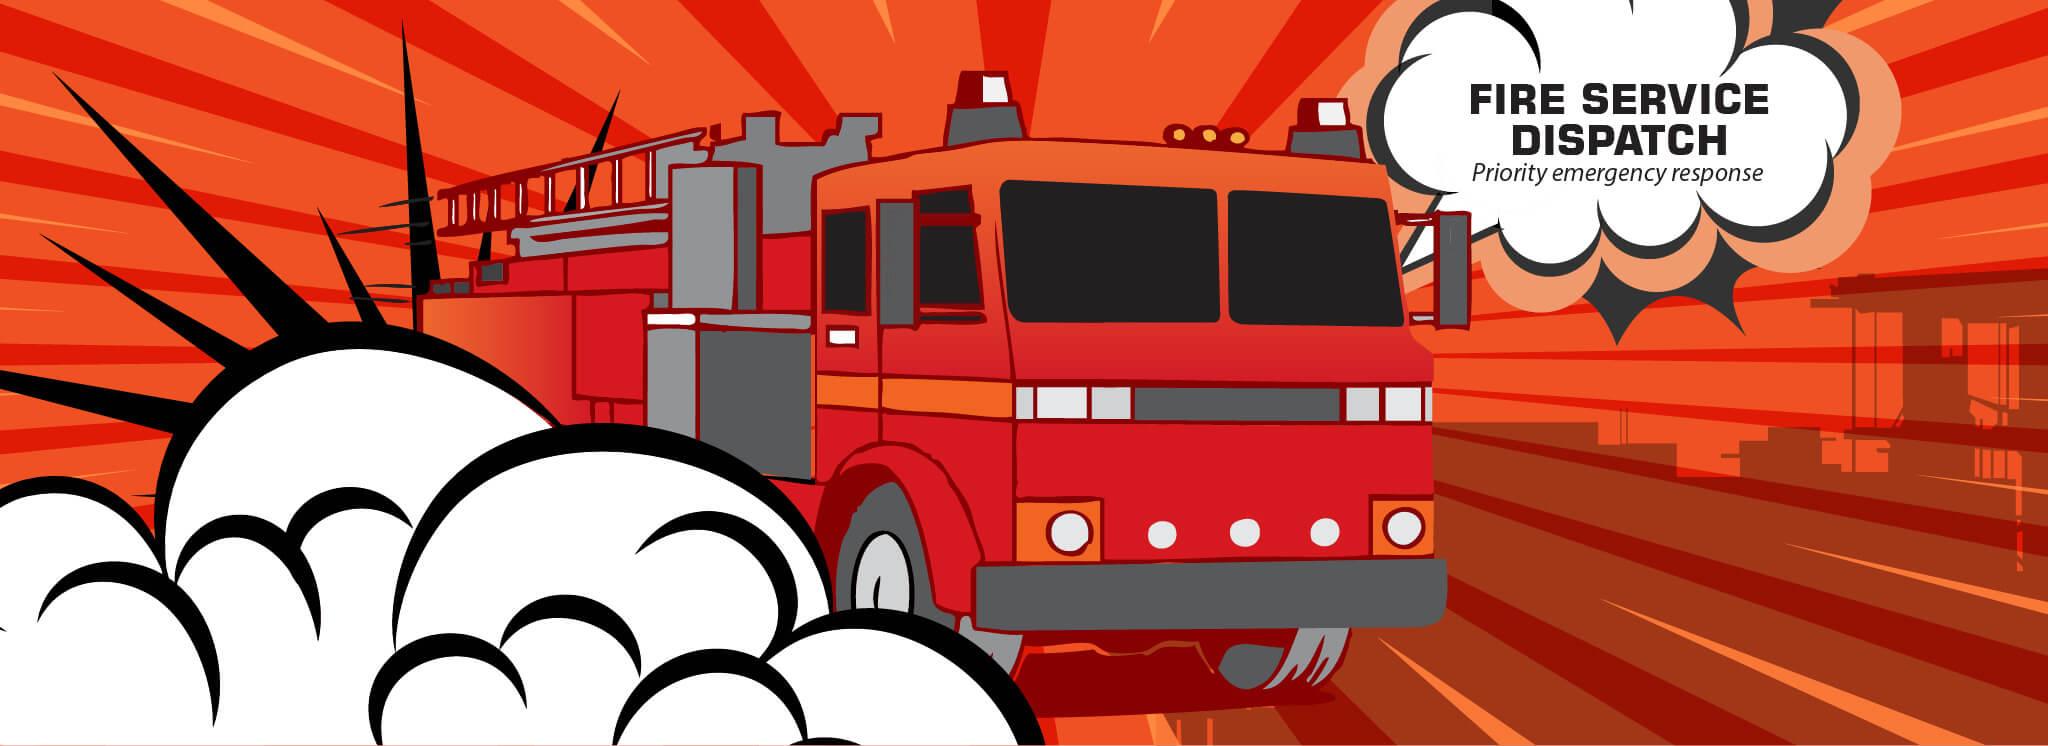 Fire Evacuation Systems.